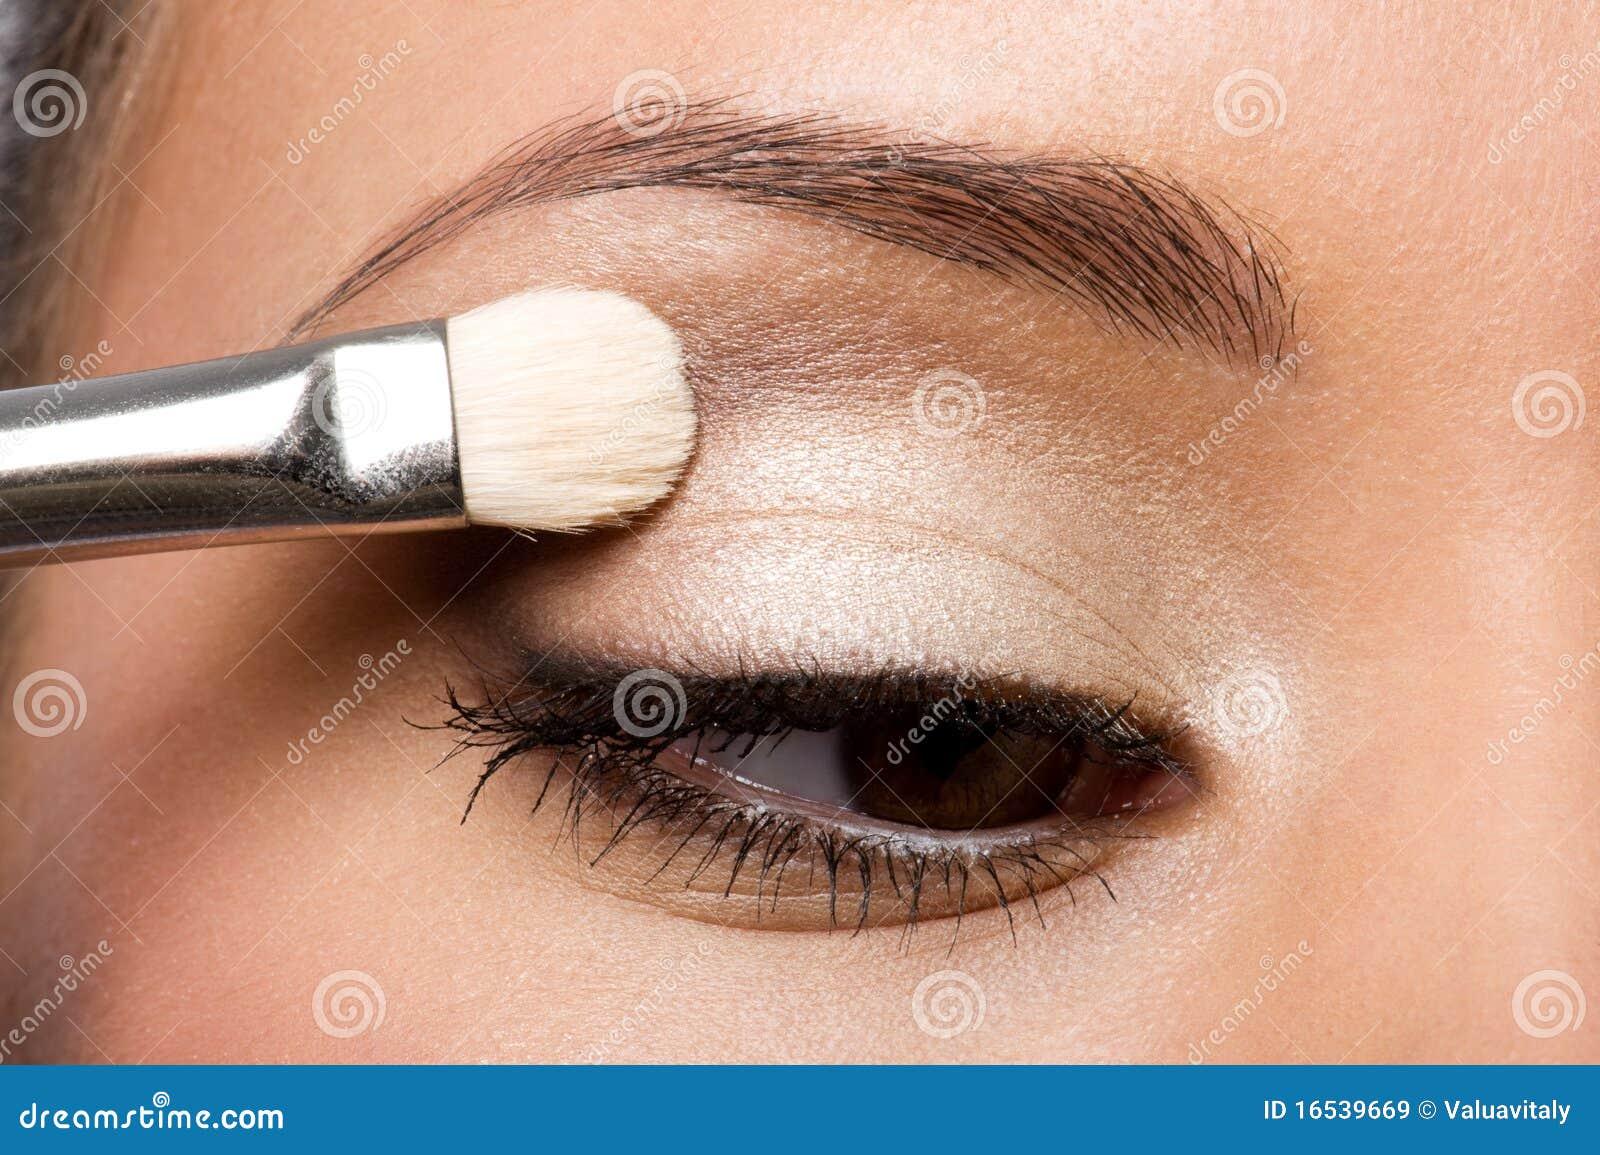 Anwenden asiatischer Augenschminke